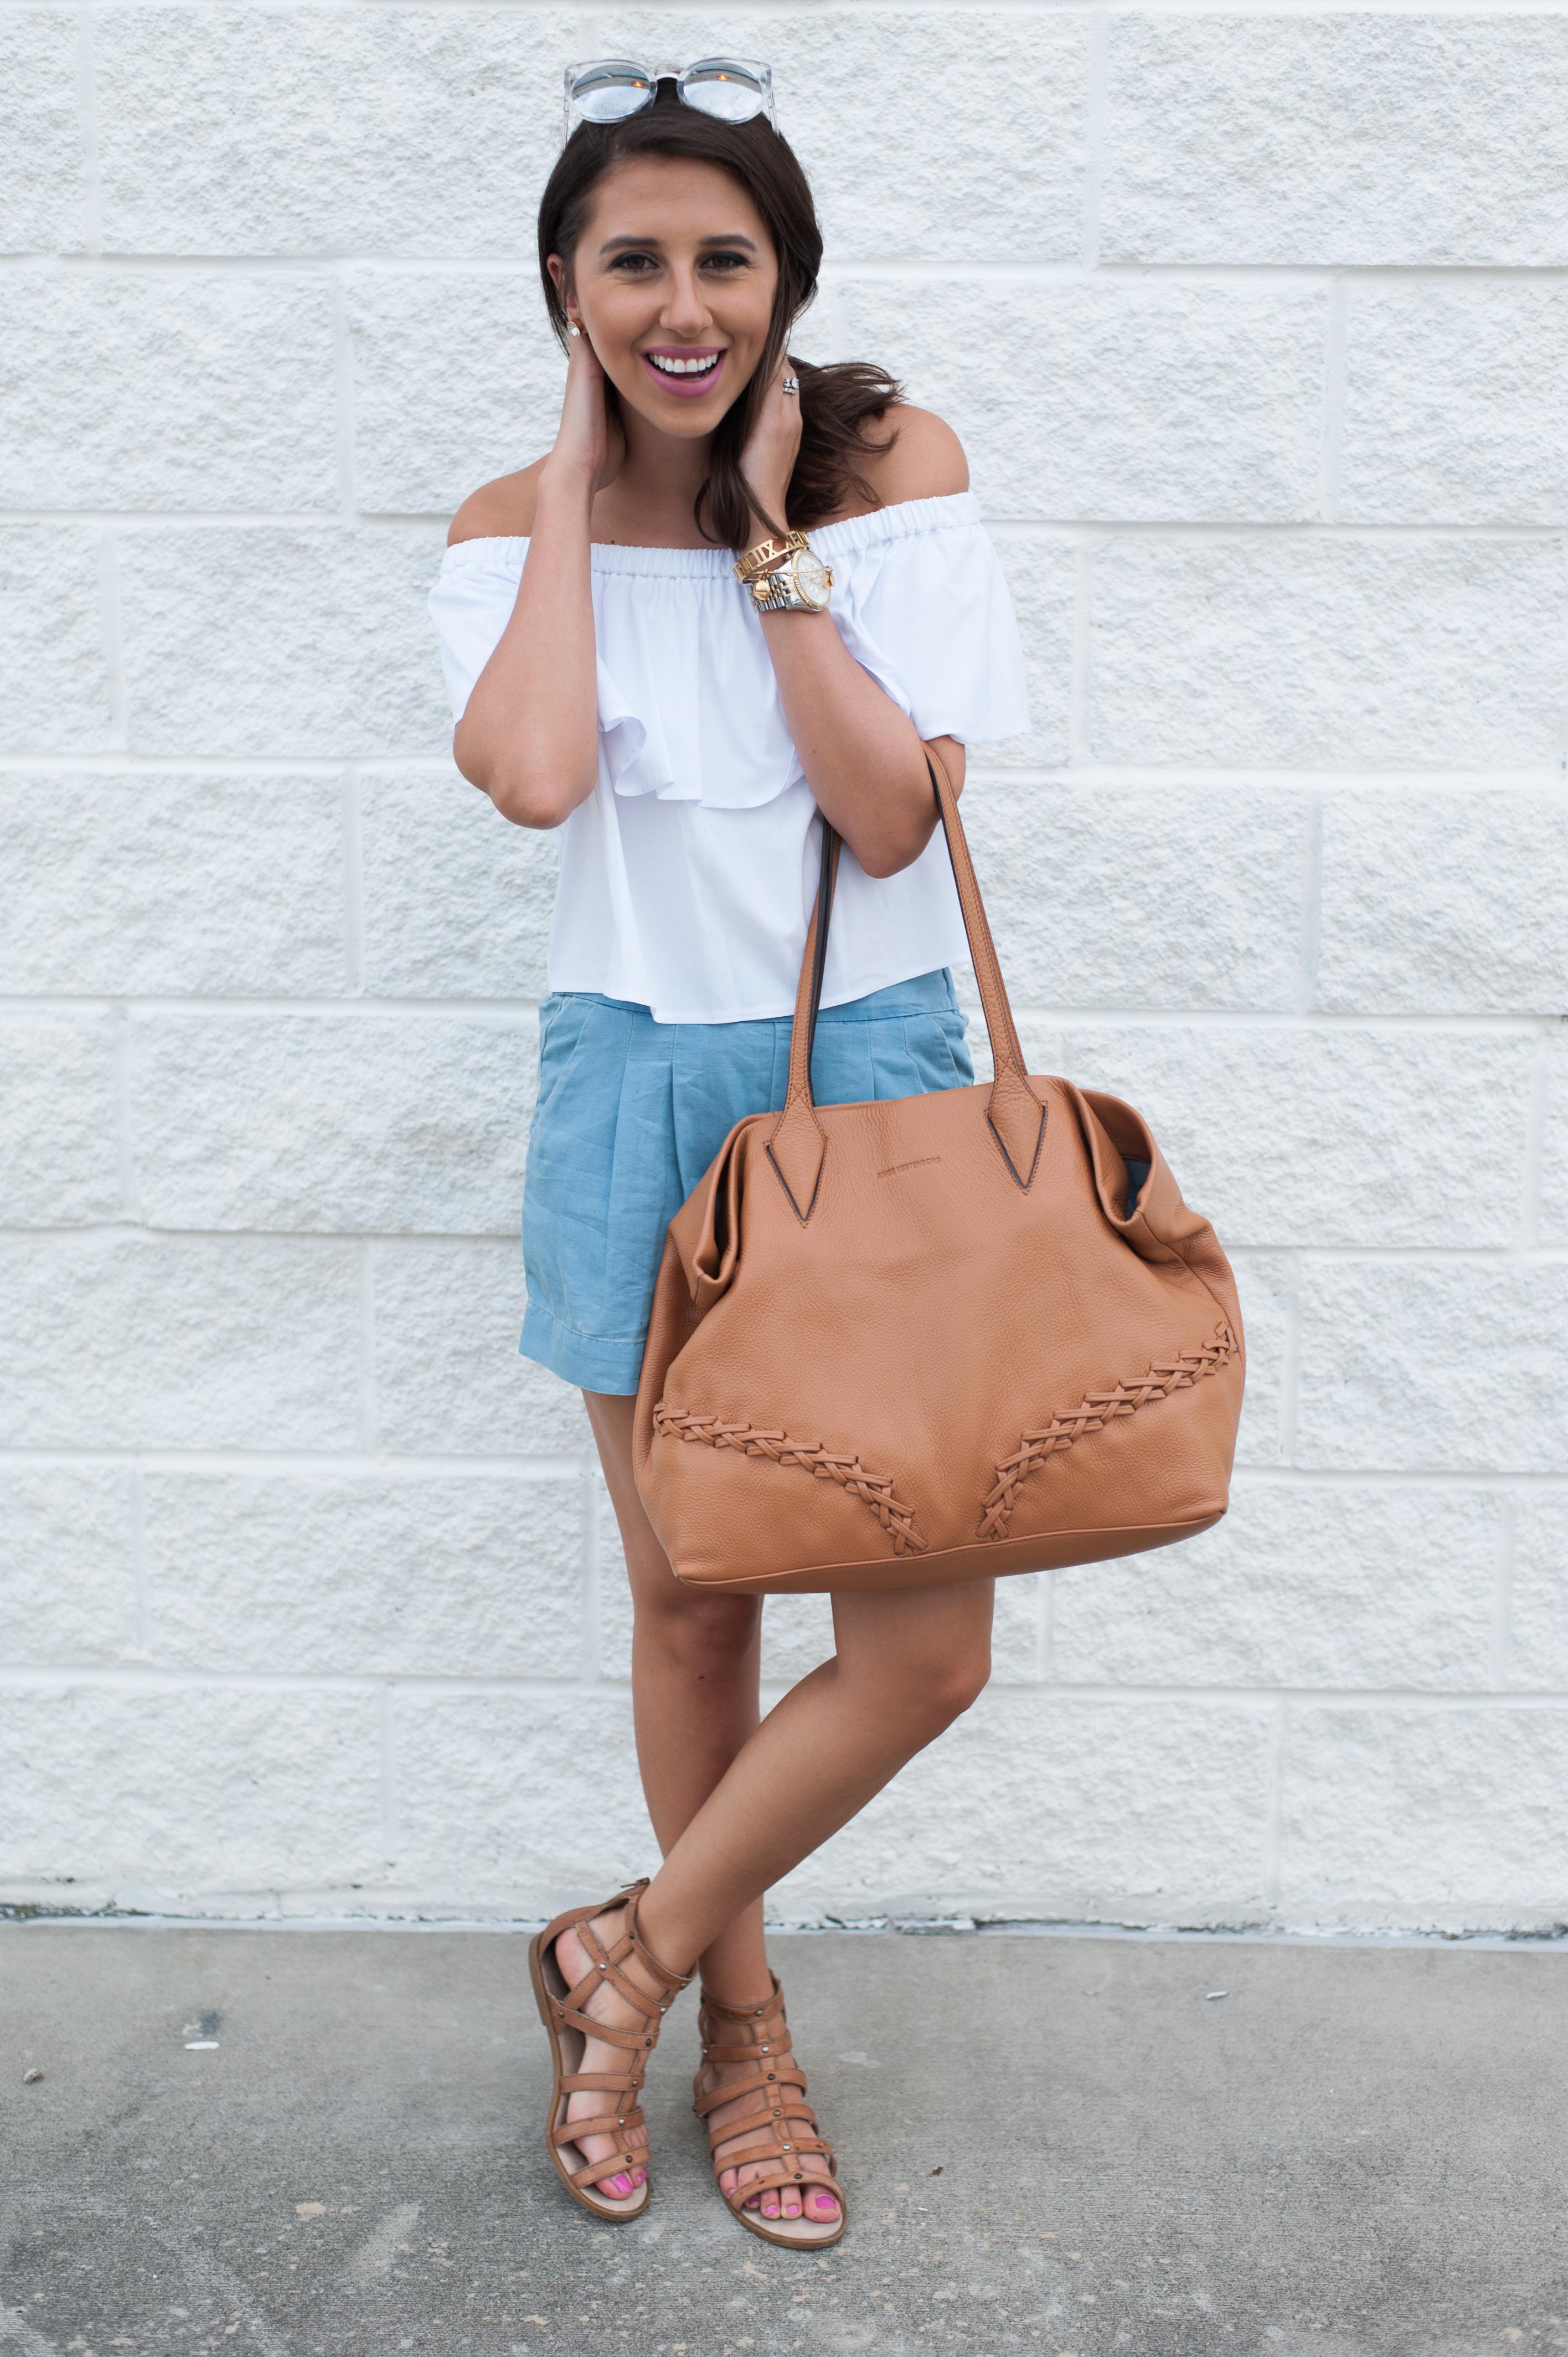 Dress Up Buttercup | Houston Fashion Blog - Dede Raad | Aimee Kestenberg Bag